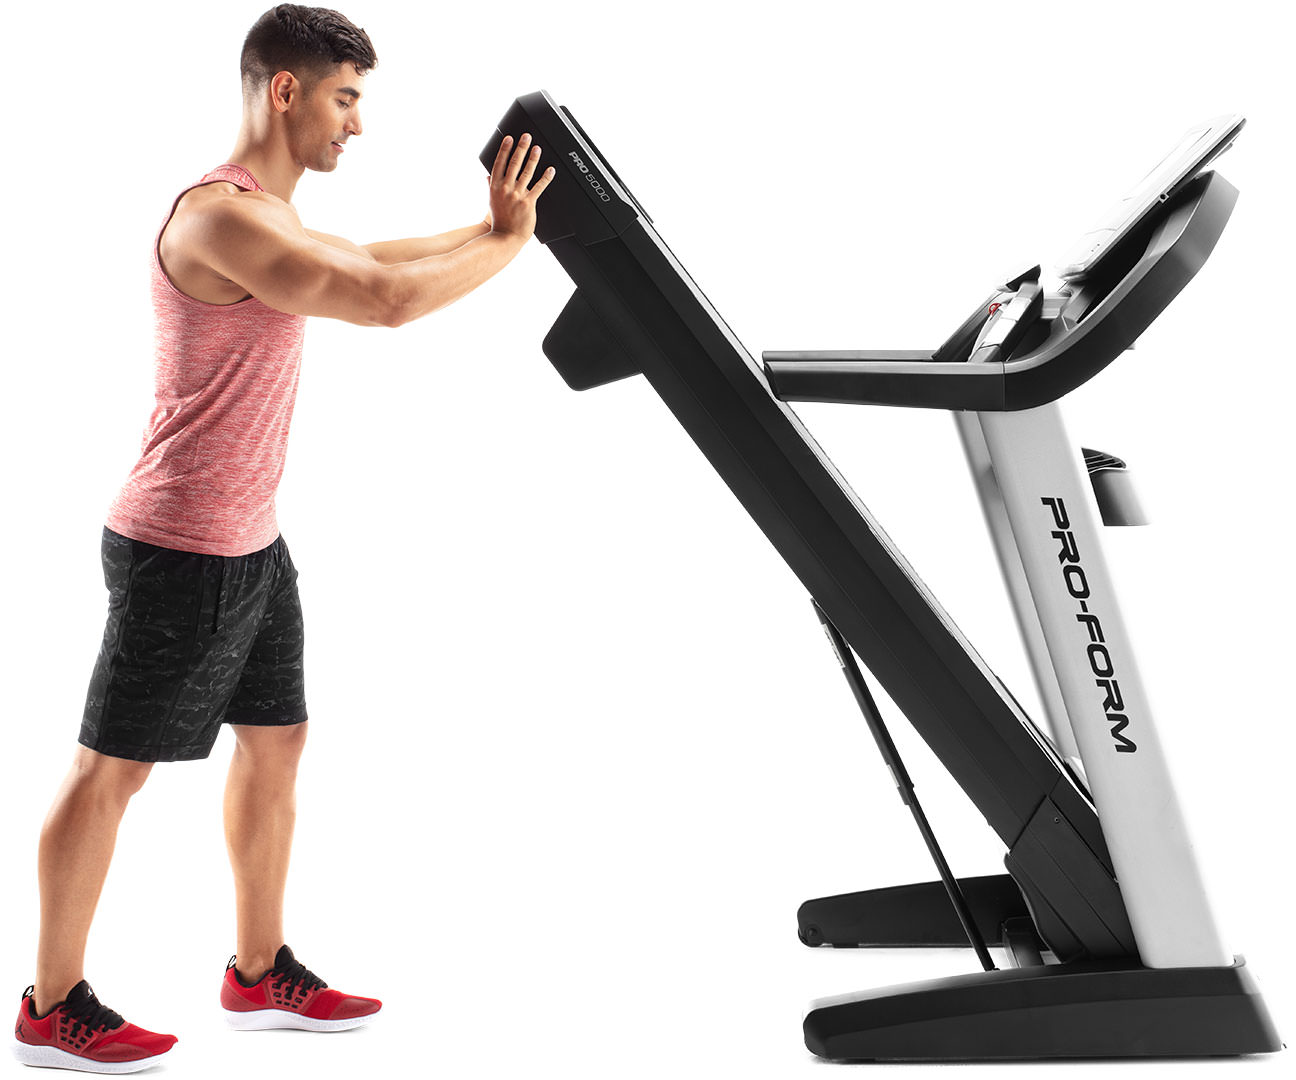 Proform Pro 5000 Review 2016: ProForm SMART Pro 5000 Treadmill